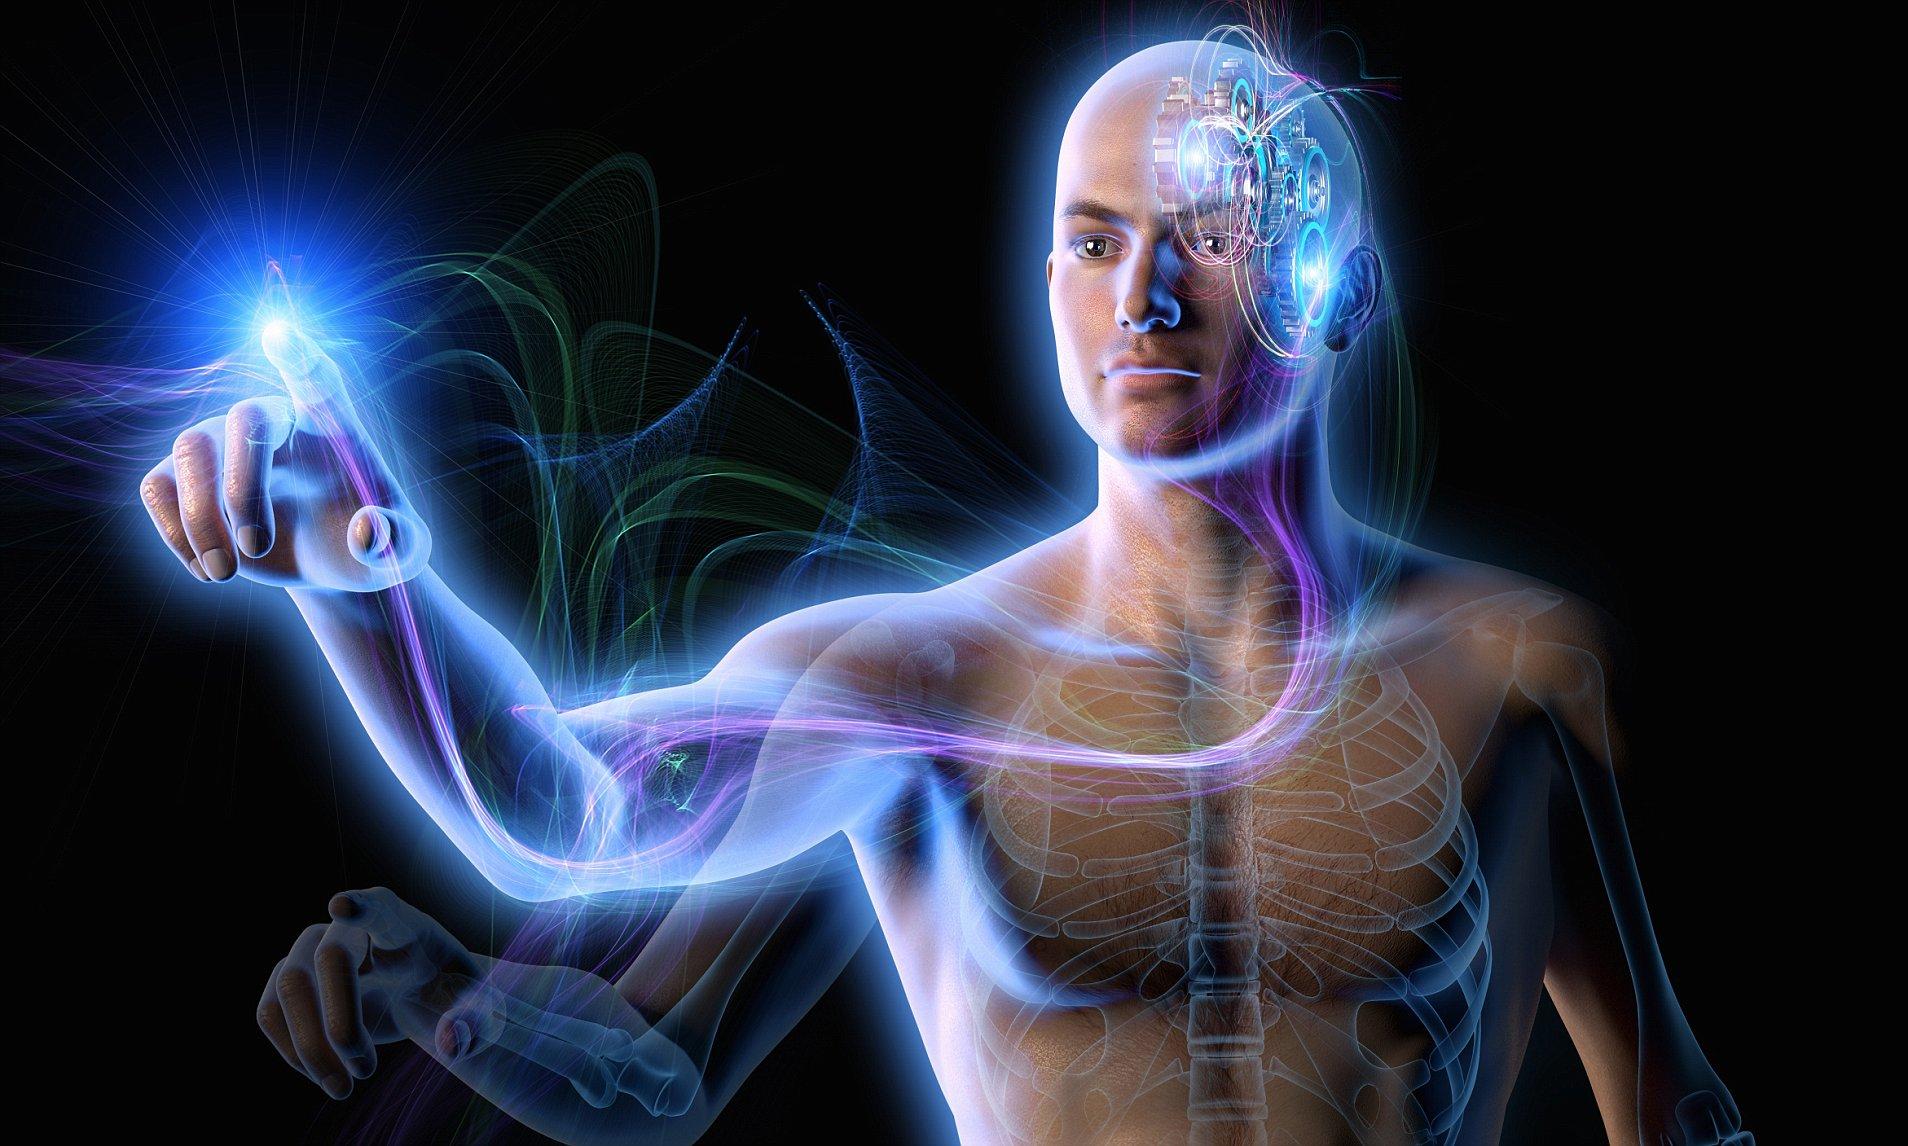 Choose Transhumanism or Yahawahshi you cannot serve 2 masters